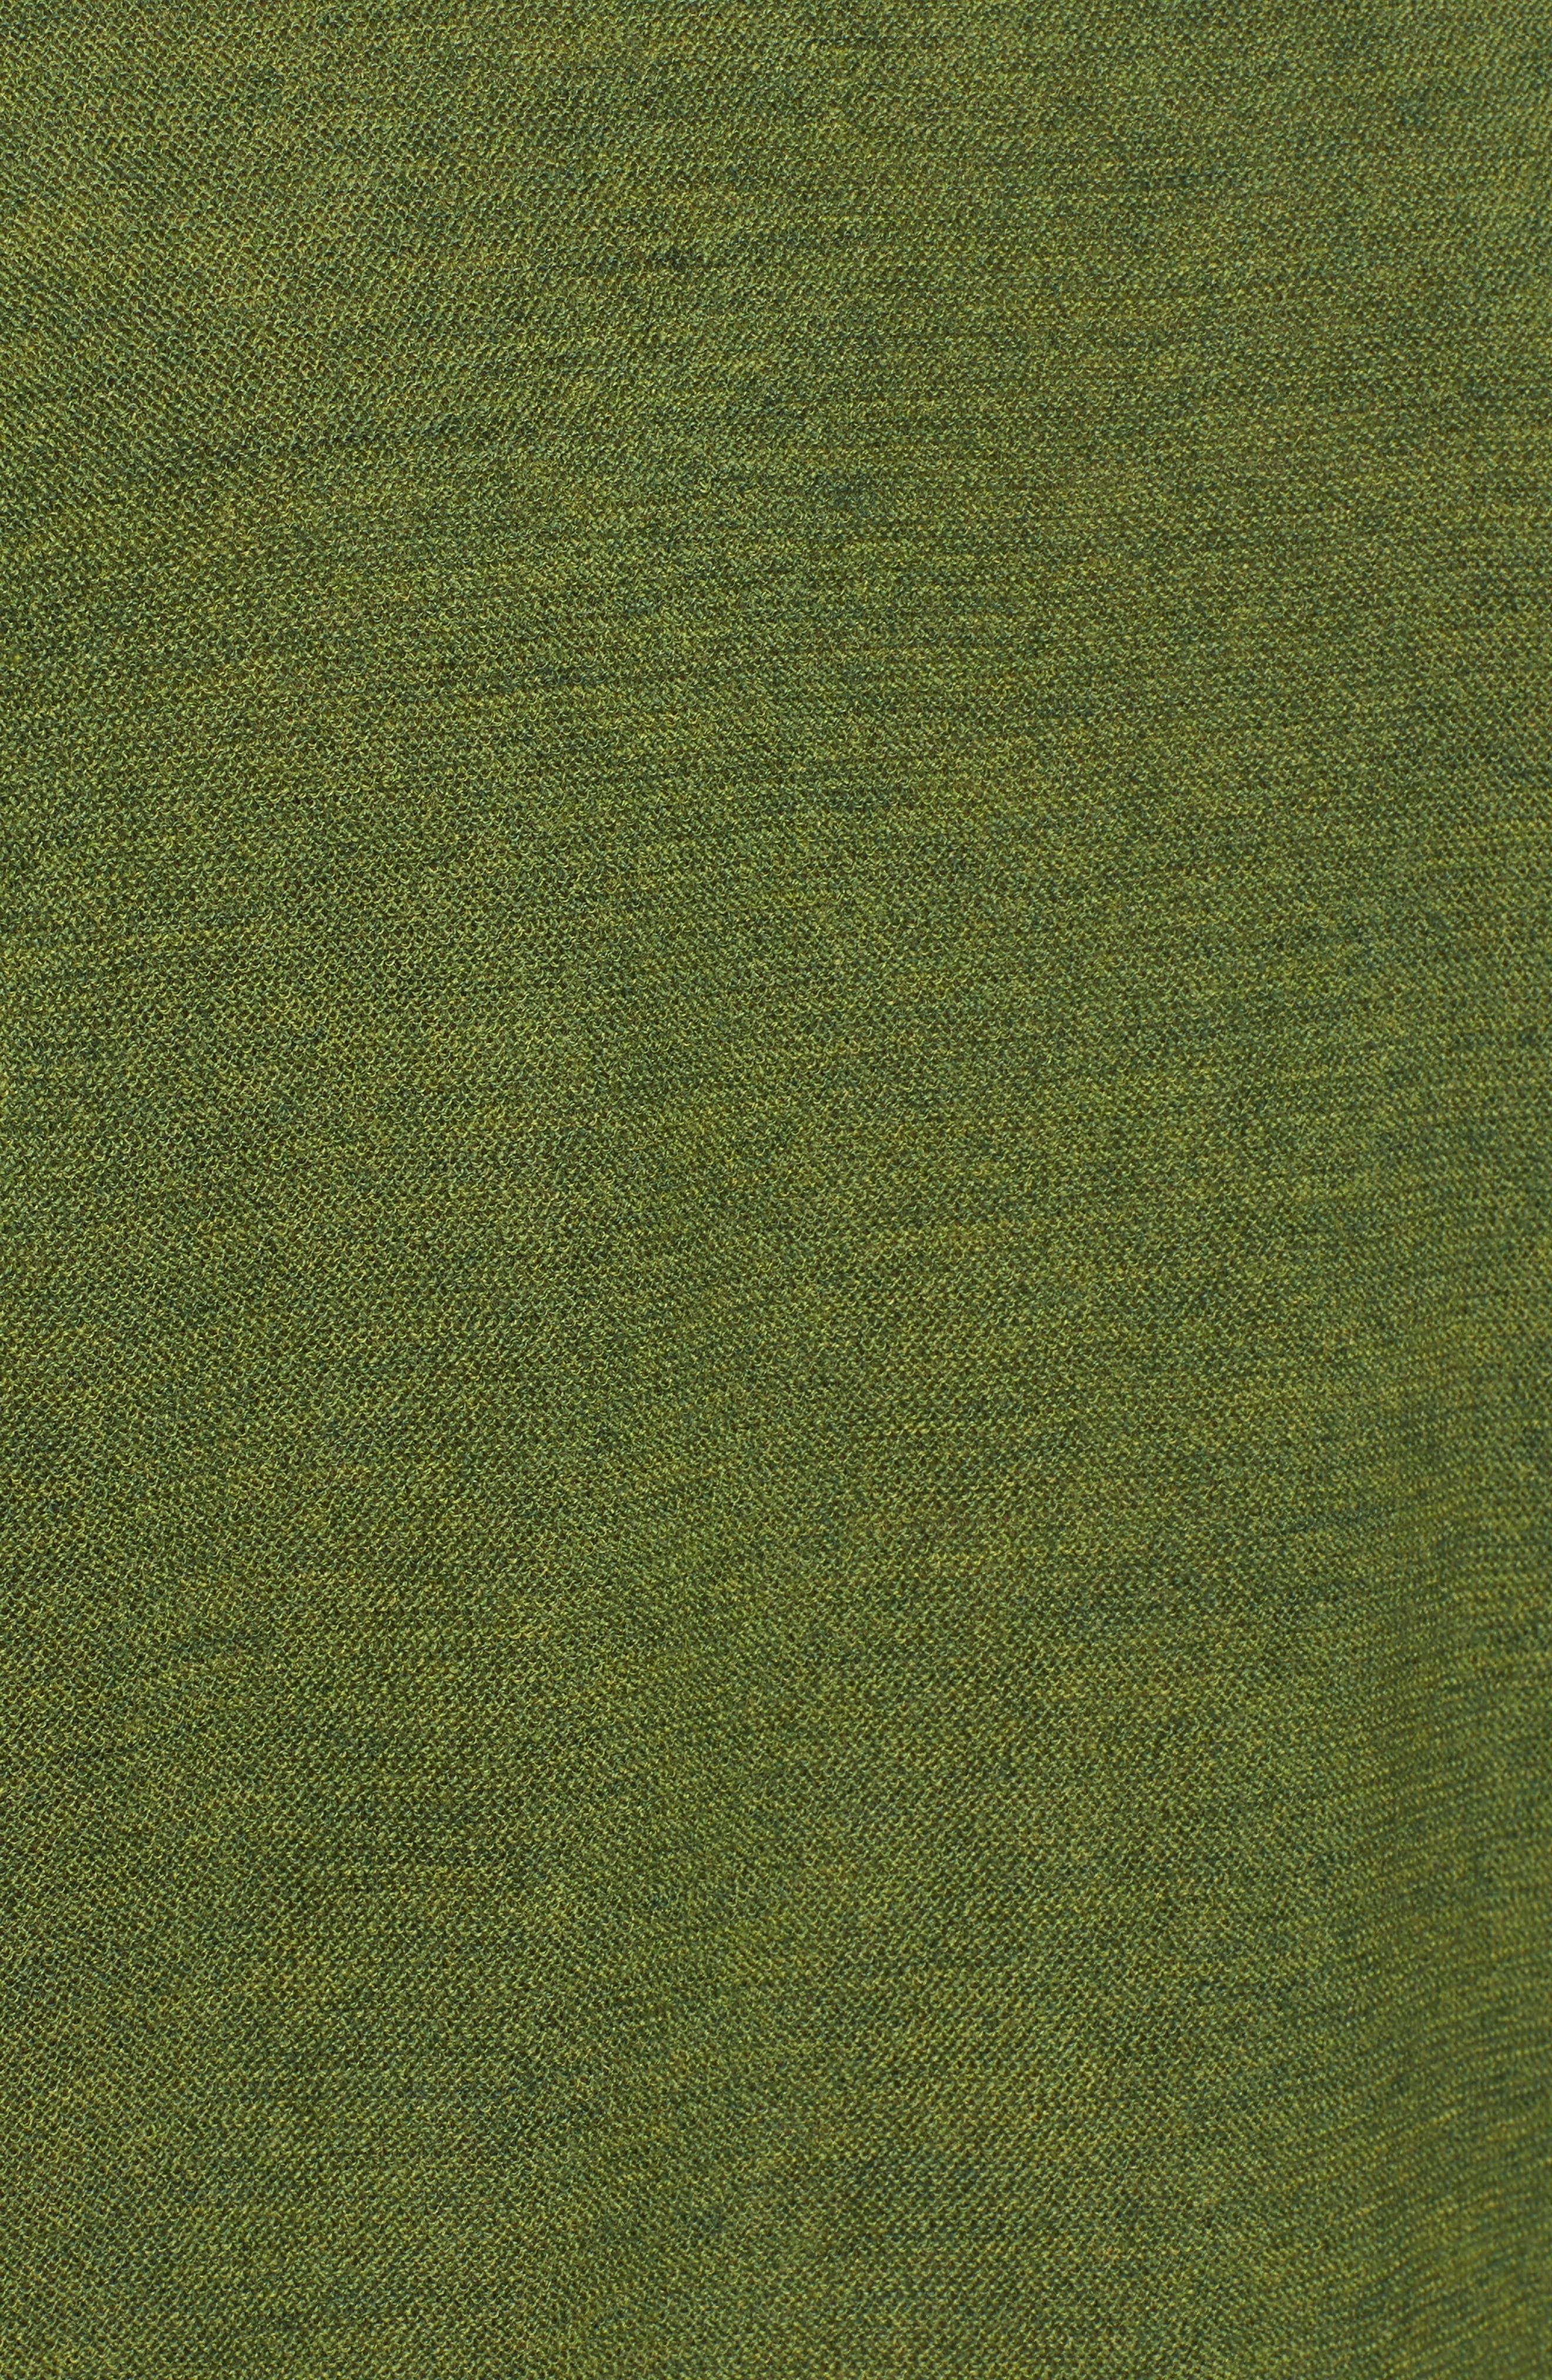 Alternate Image 5  - Eileen Fisher Mix Stitch Merino Bateau Neck Sweater (Regular & Petite)